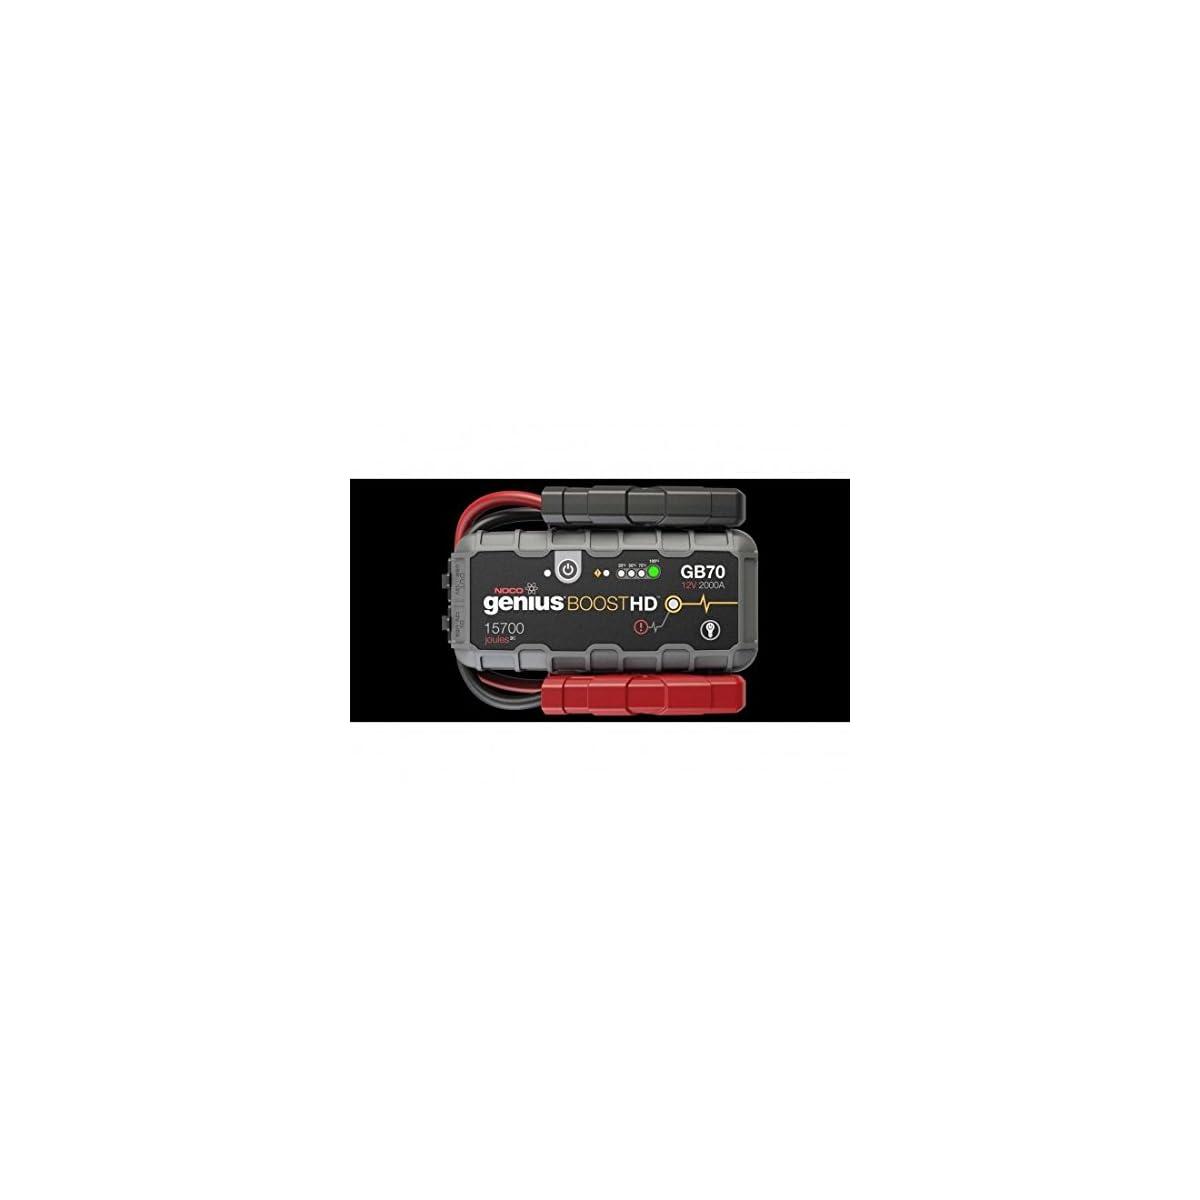 41ufSkFo4OL. SS1200  - Booster de batería NOCO gb70litio 12V 2000A-Noco 010109